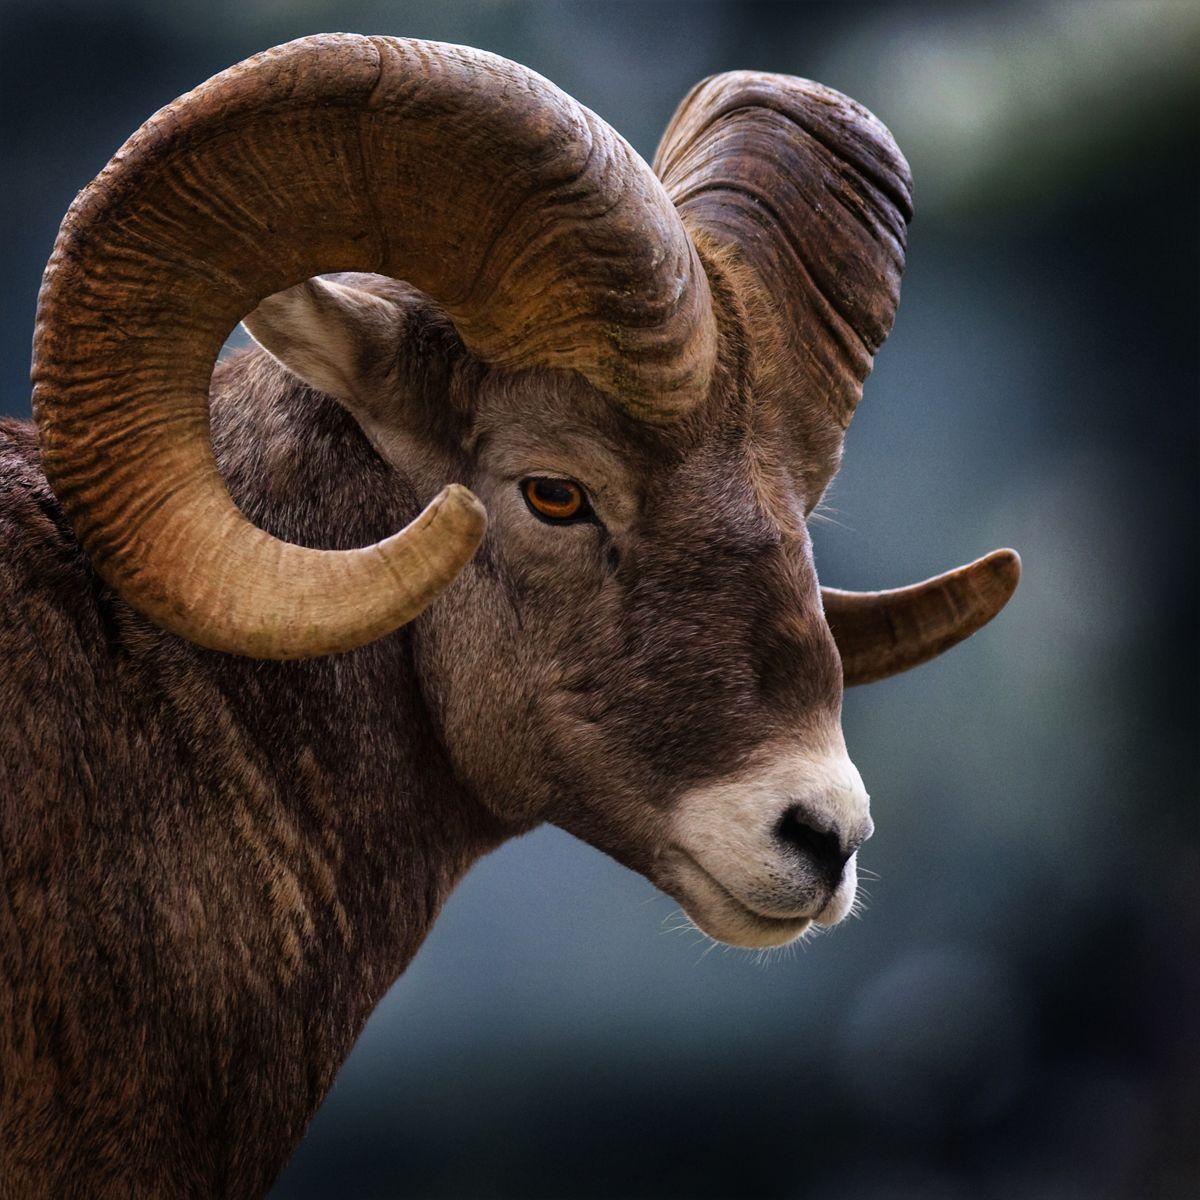 Colorado State Animal Rocky Mountain Bighorn Sheep